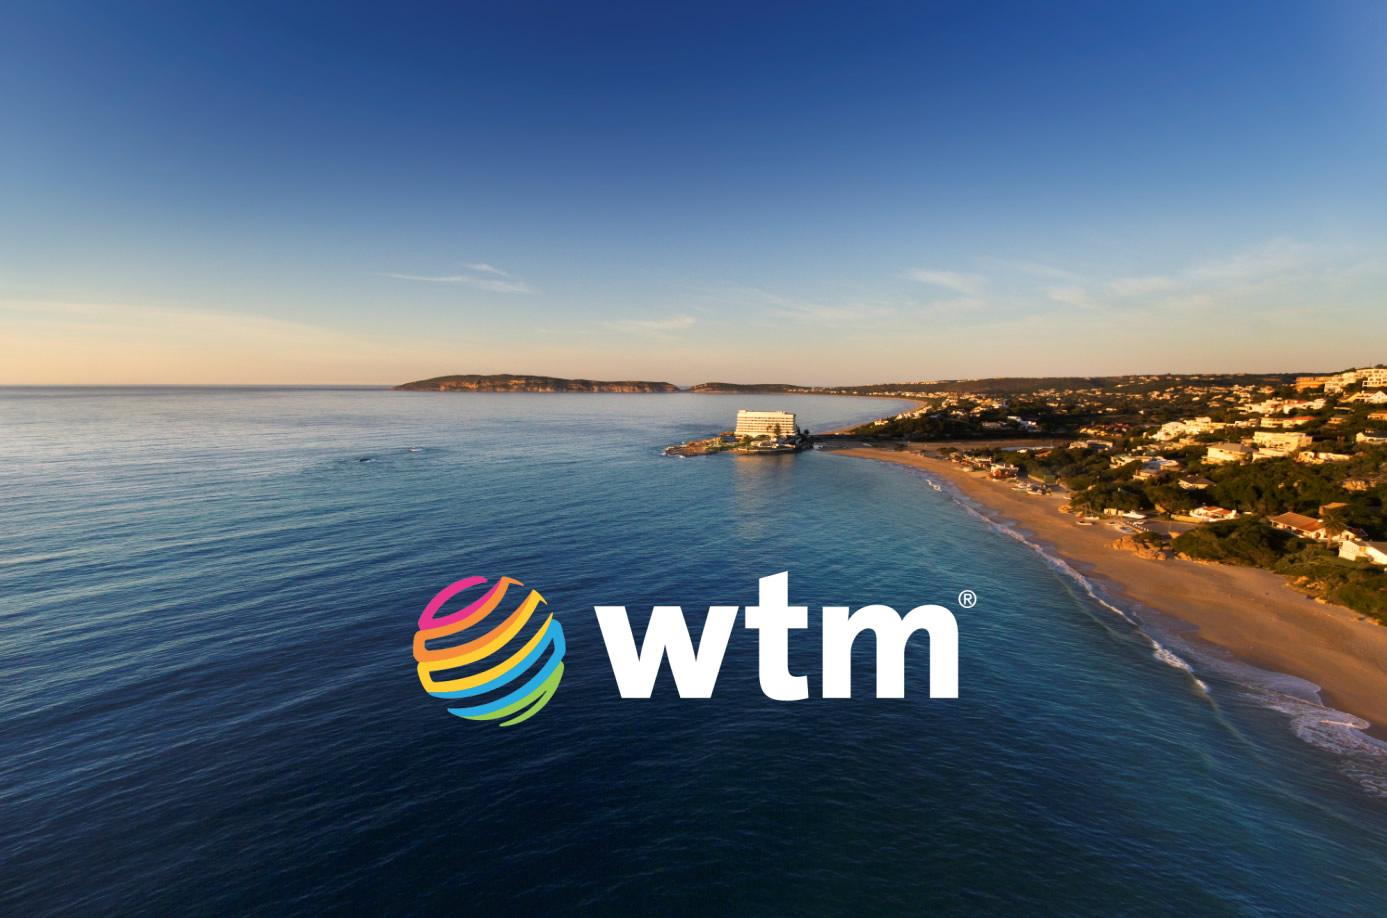 wtm virtual plett aerial